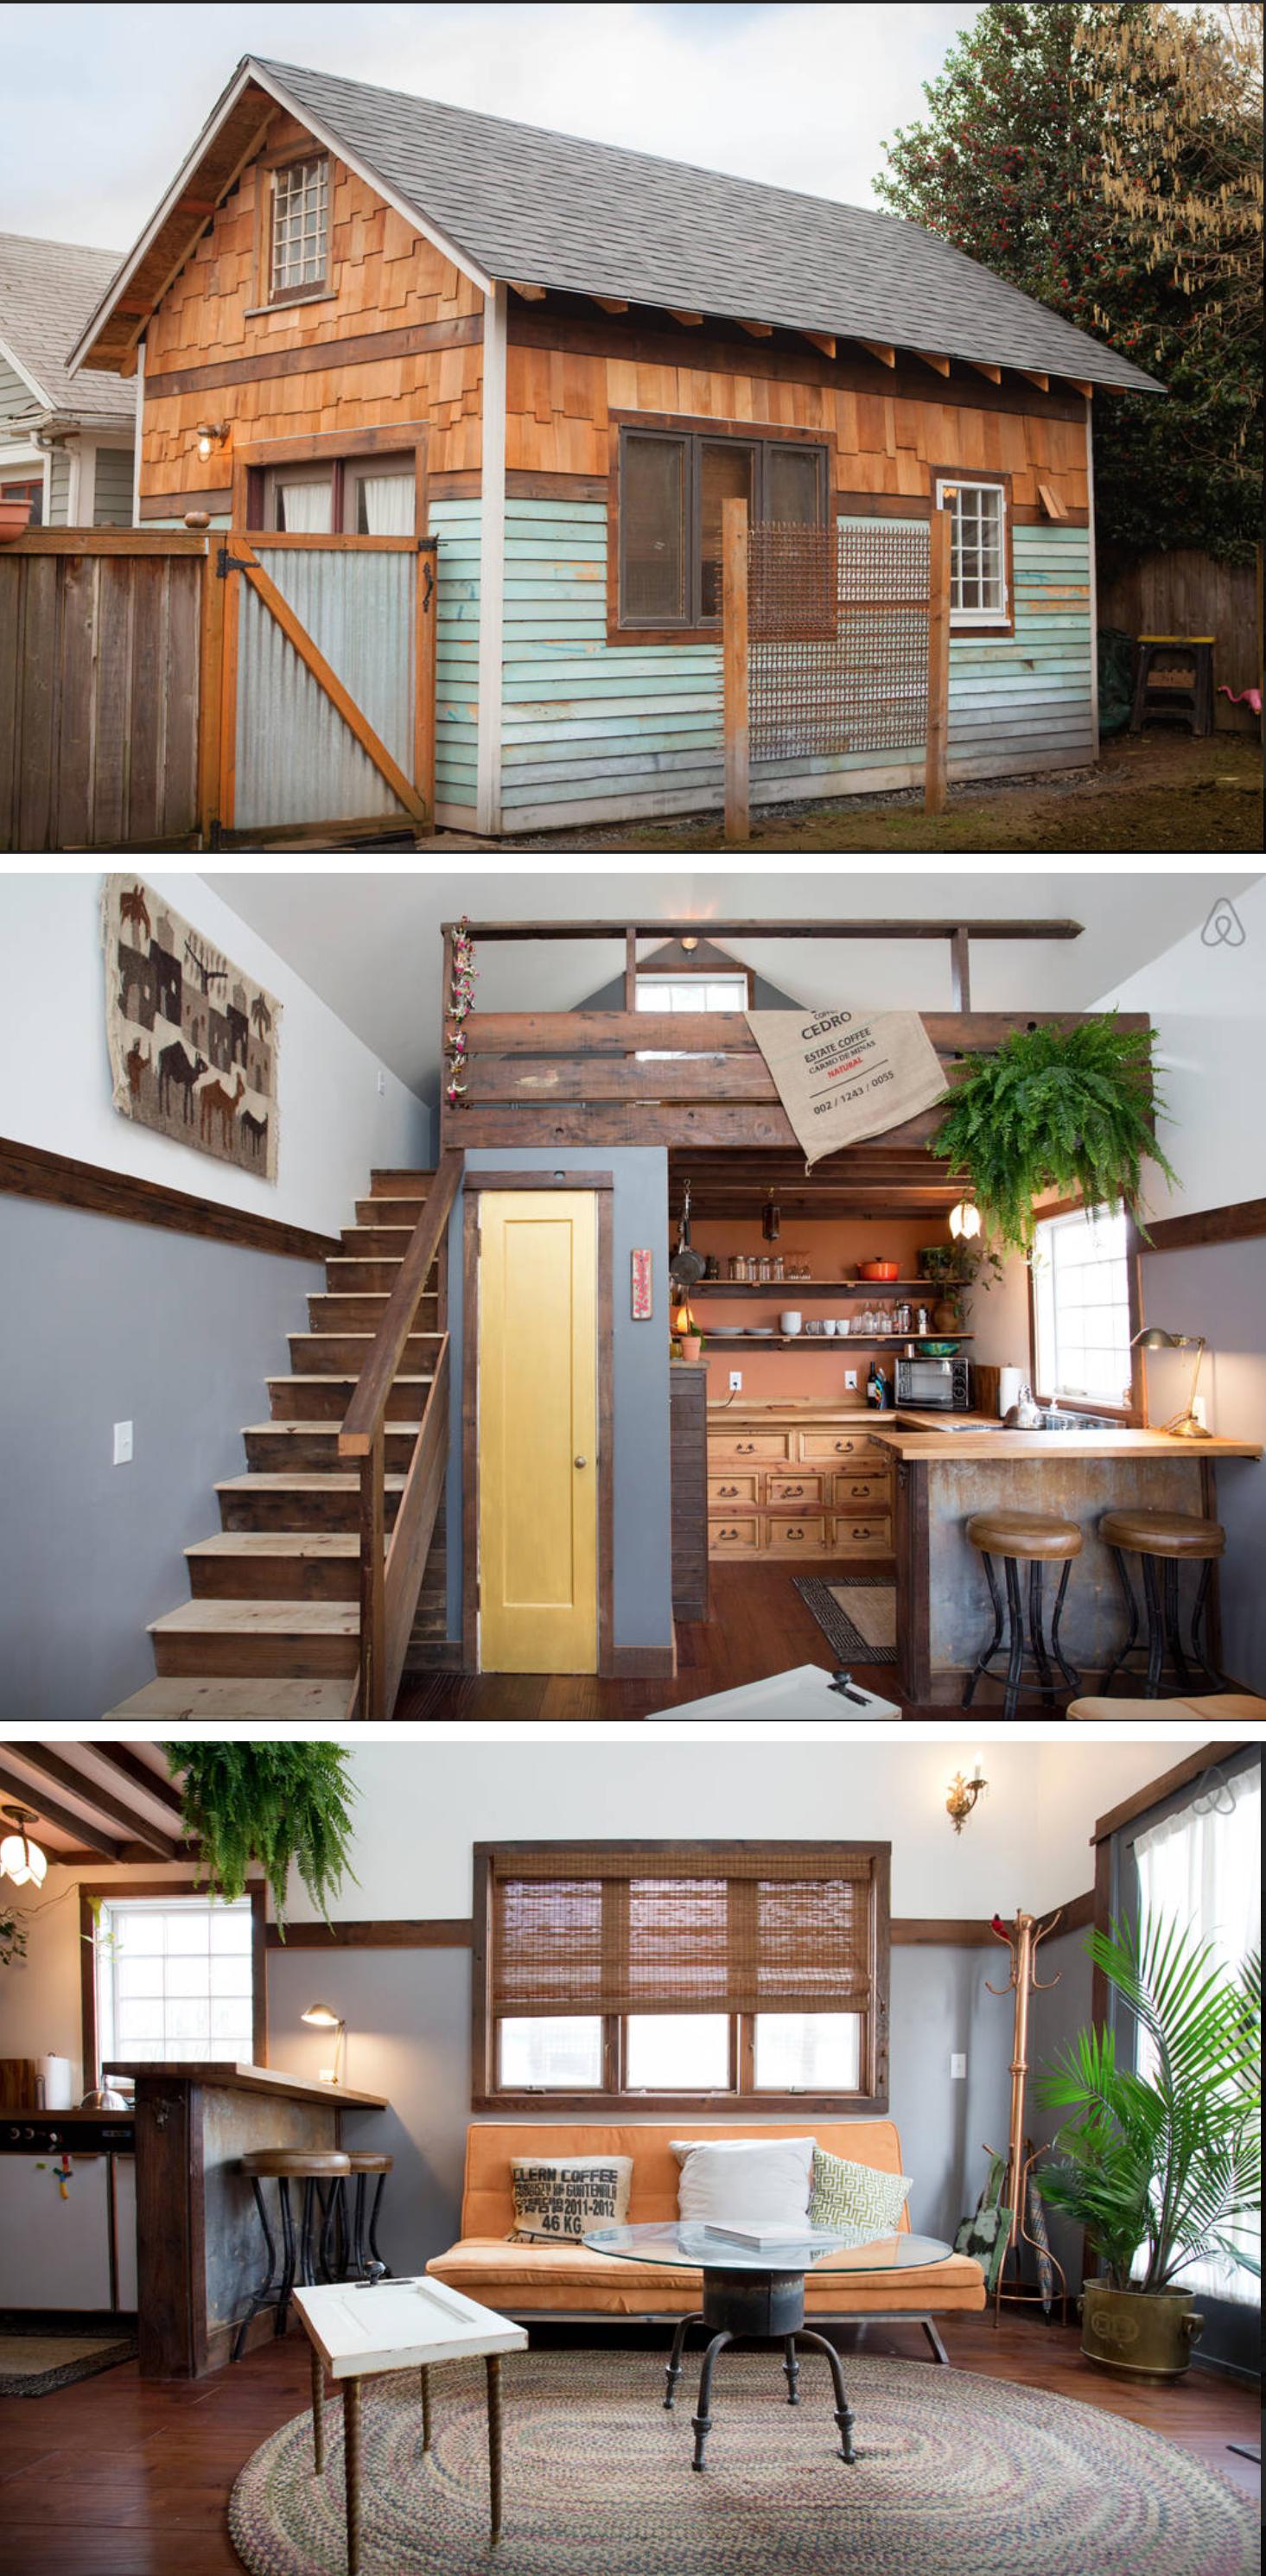 "Modern Tiny House: Portland, OR, USA. Seen On The TV Show ""Tiny House Nation"